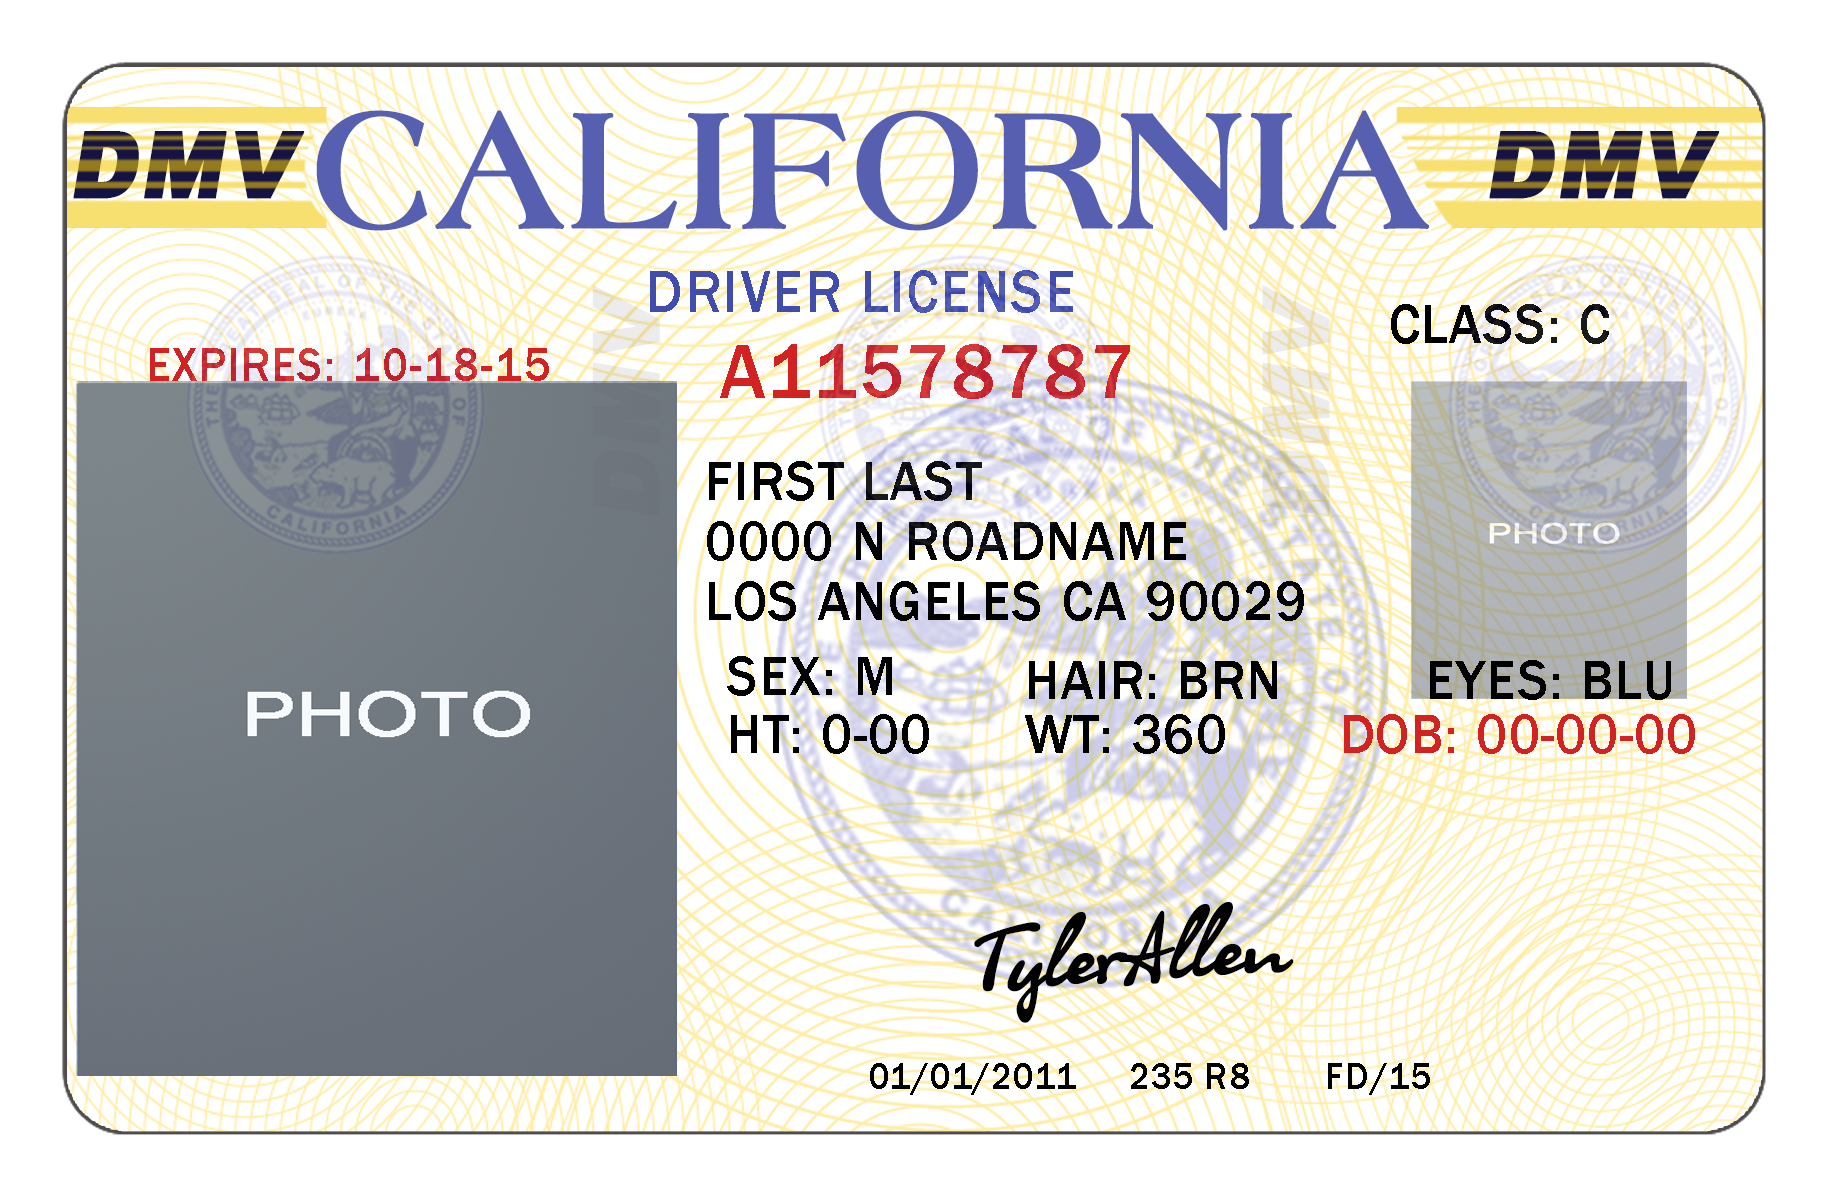 California Drivers License Template | California | Drivers License - Free Printable Fake Drivers License